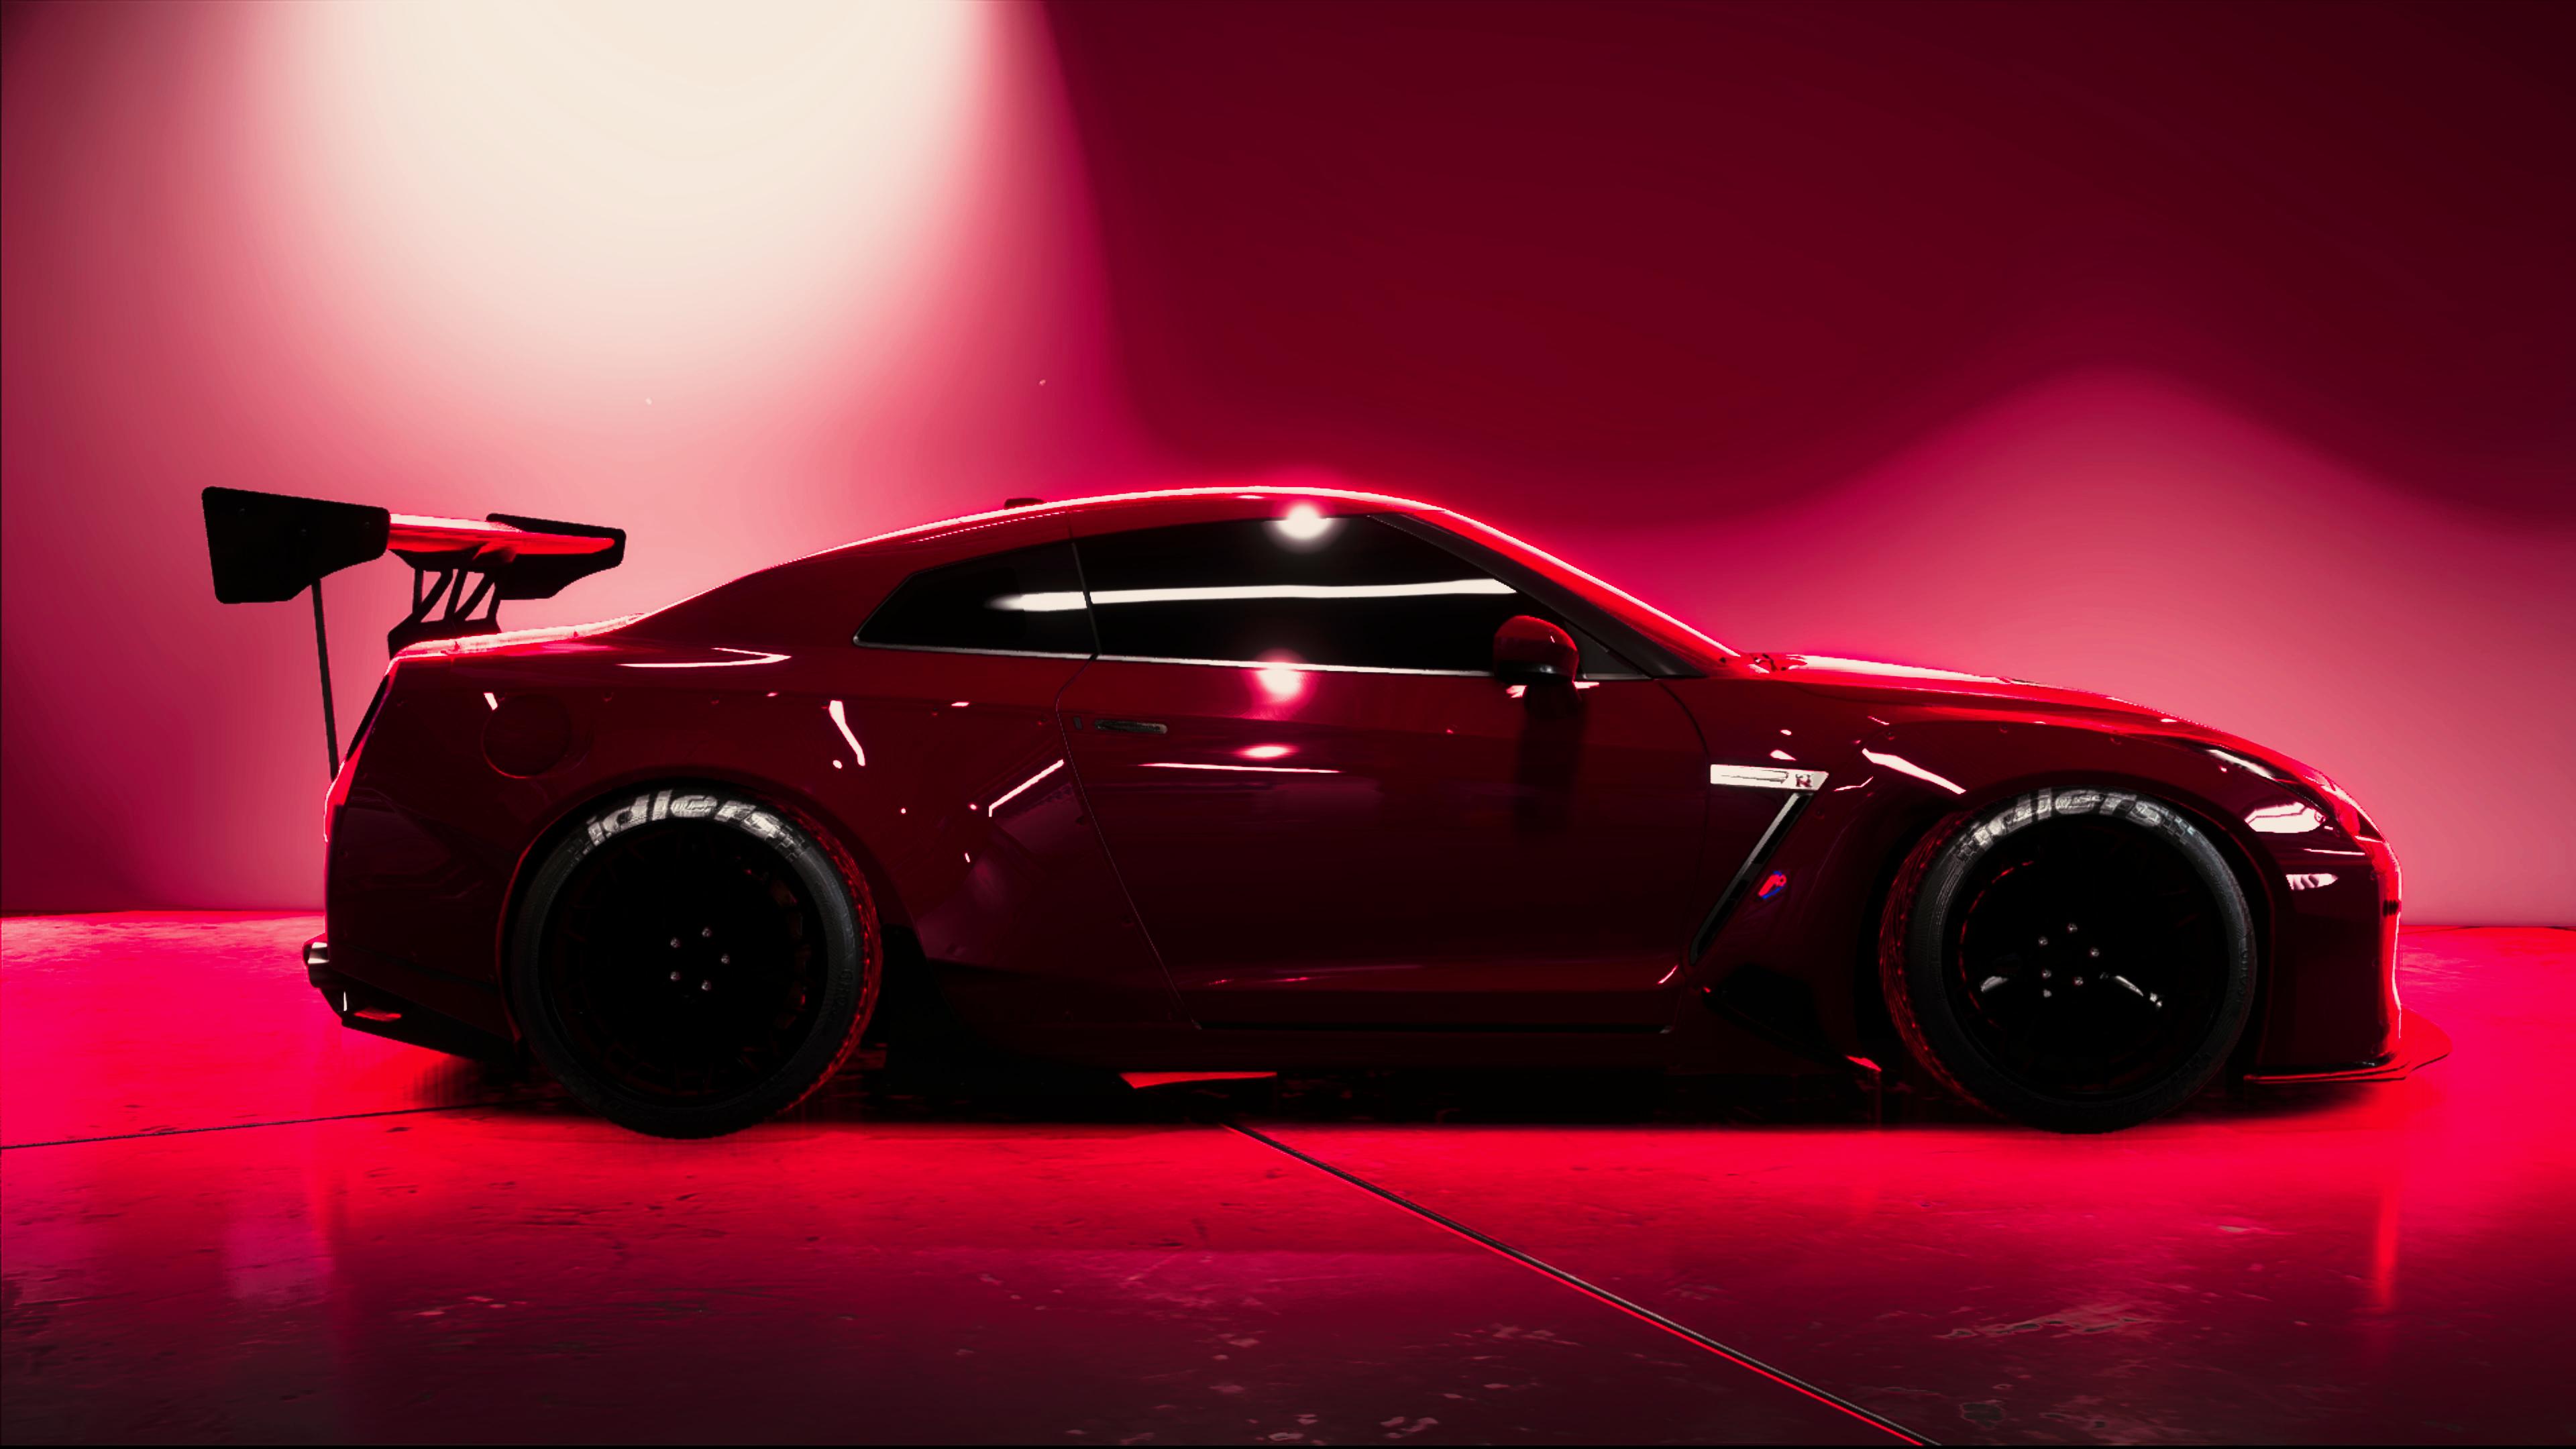 Nissan GTR Red Rocket Bunny Car